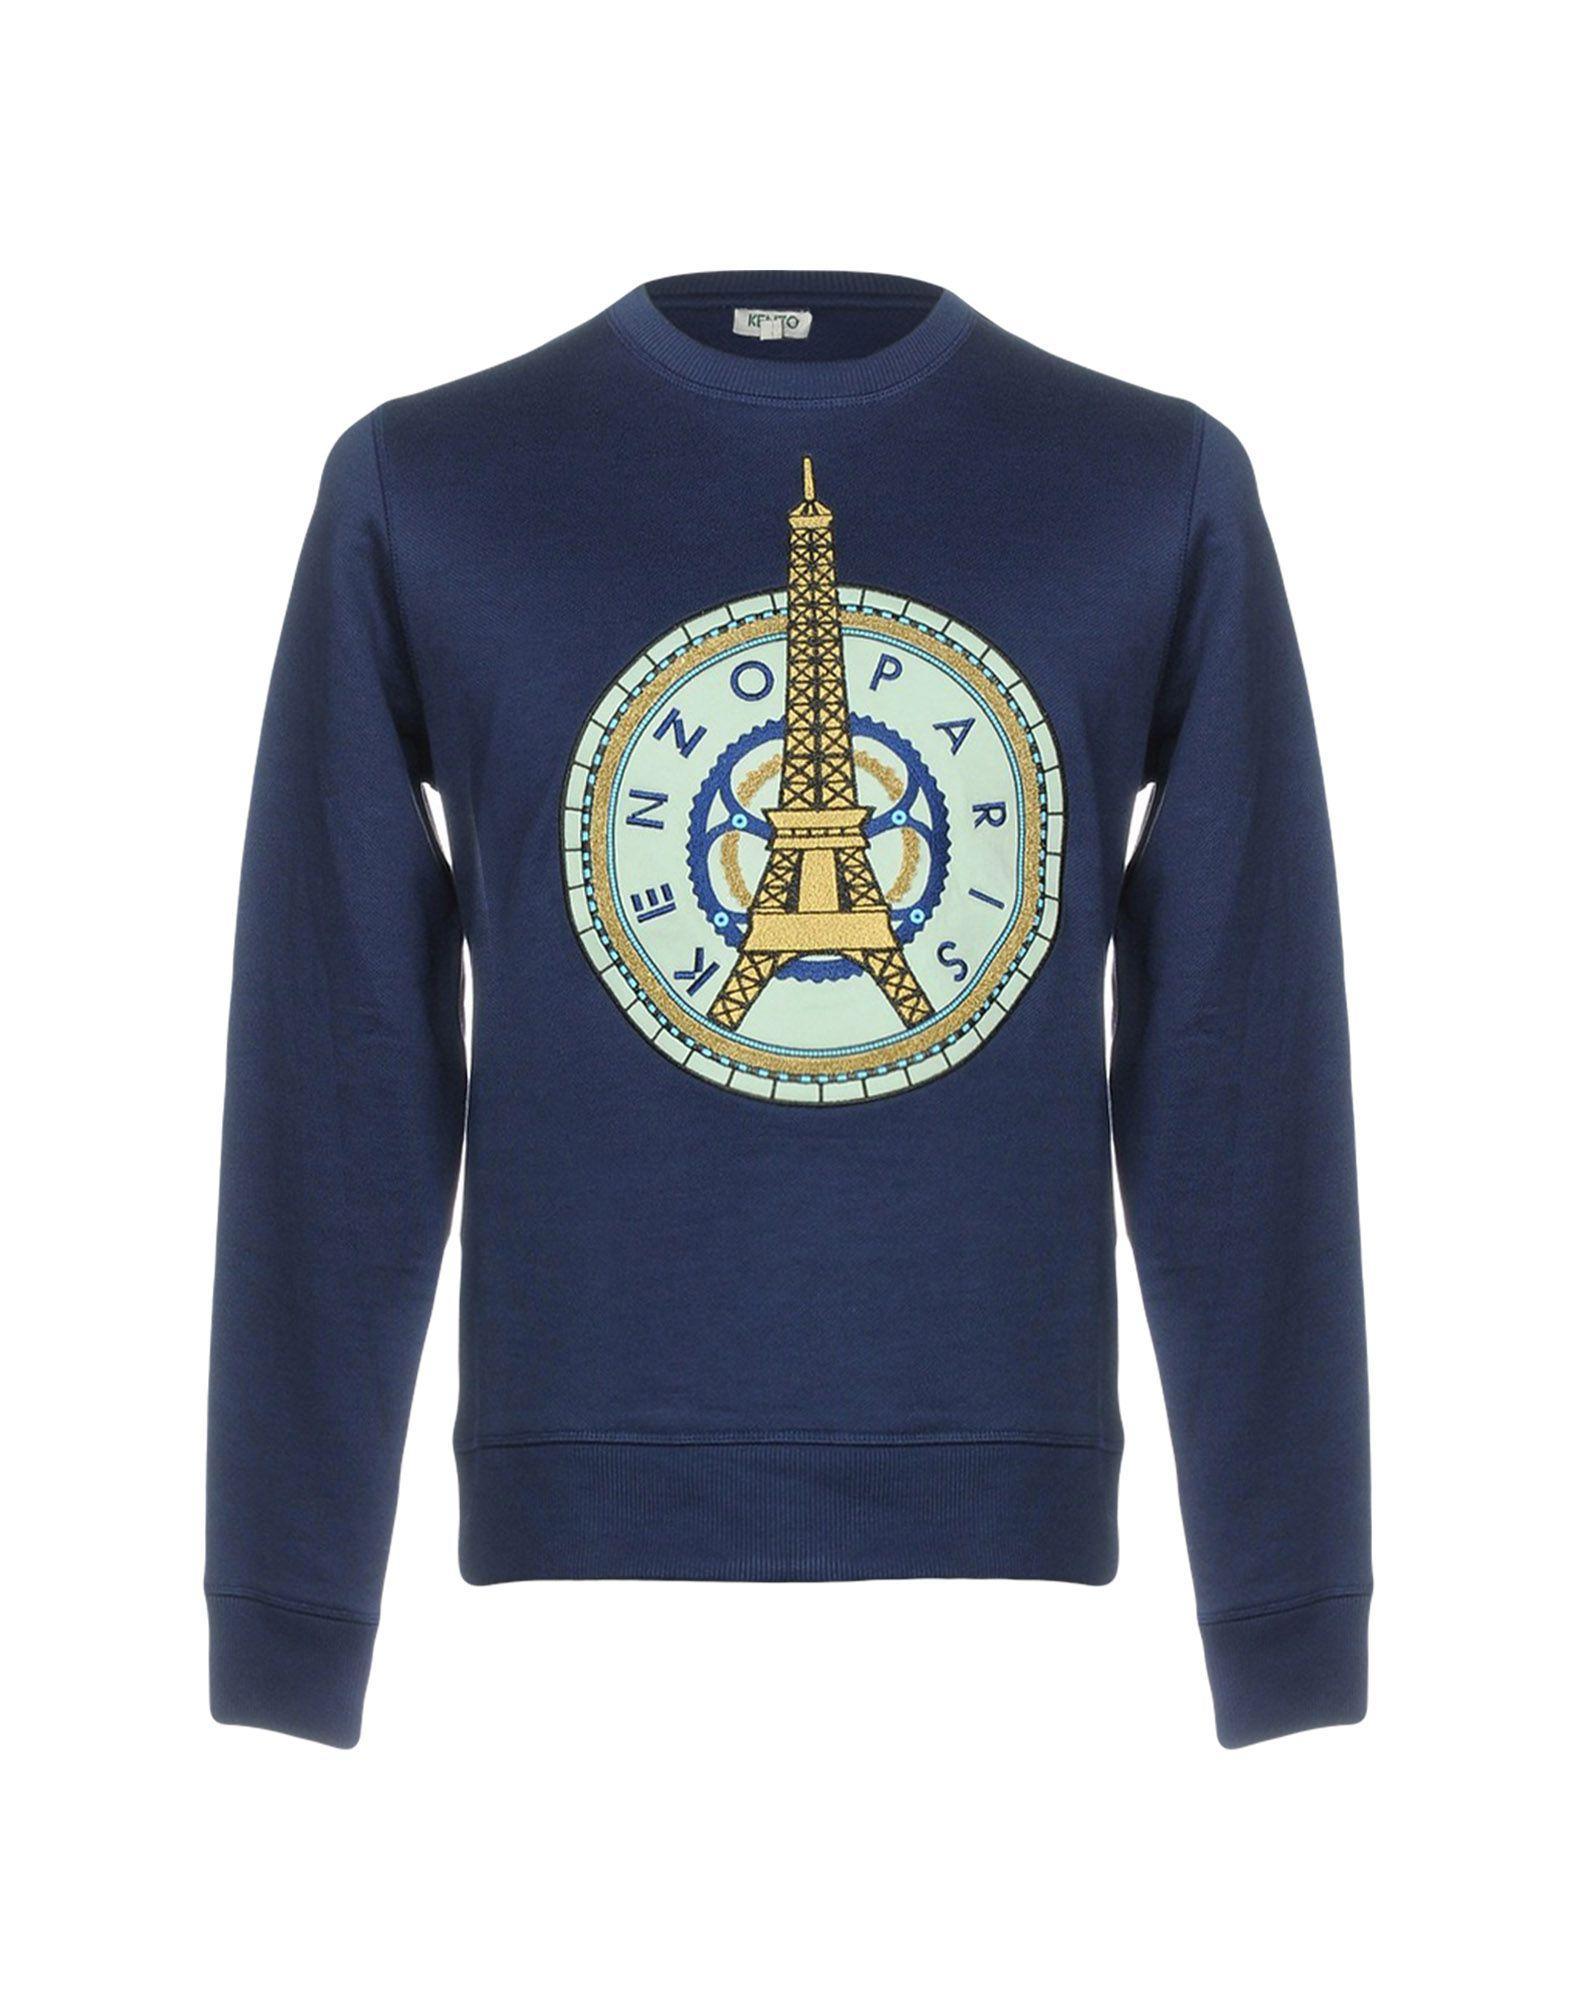 Kenzo Sweatshirts In Dark Blue